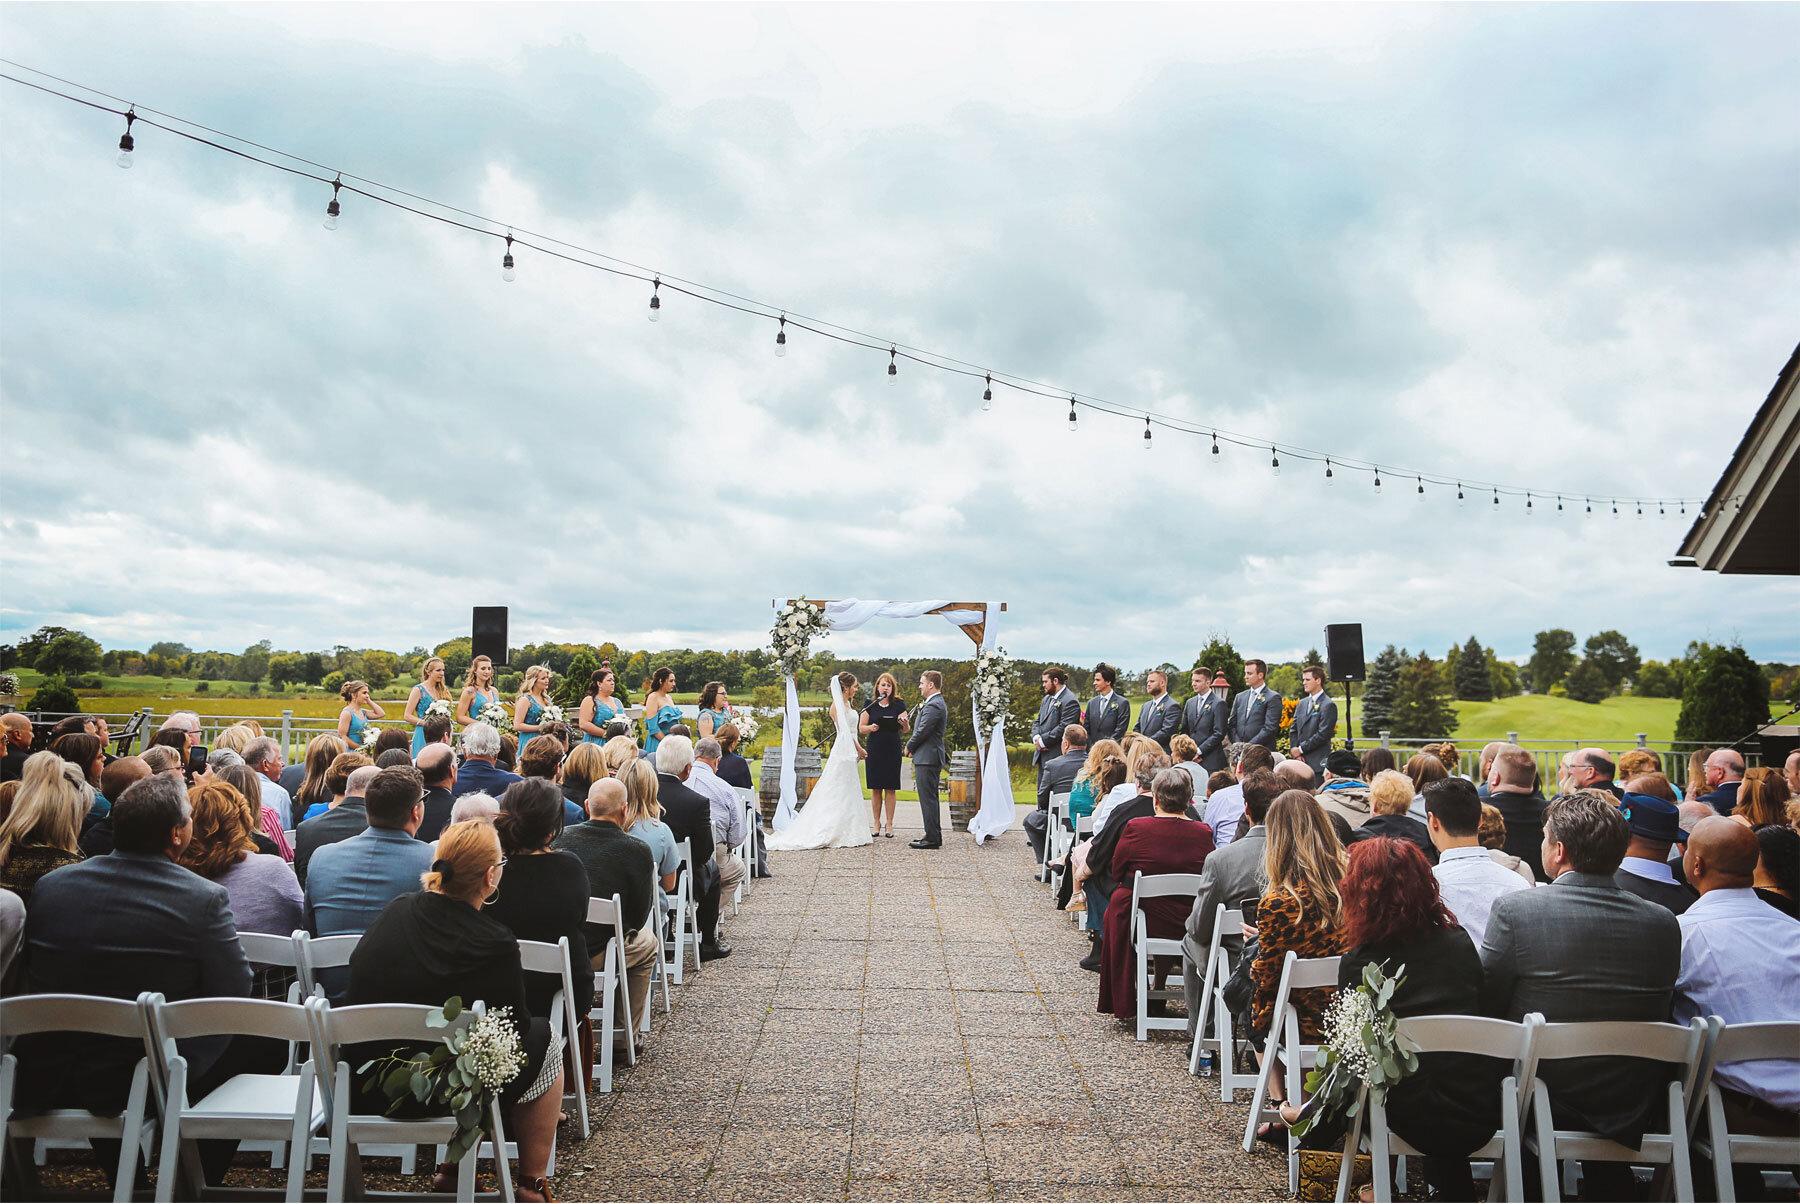 10-Vick-Photography-Minneapolis-Minnesota-Wedding-Rush-Creek-Golf-Club-Ceremony-Outdoor-Bride-Groom-Amanda-and-Michael.jpg